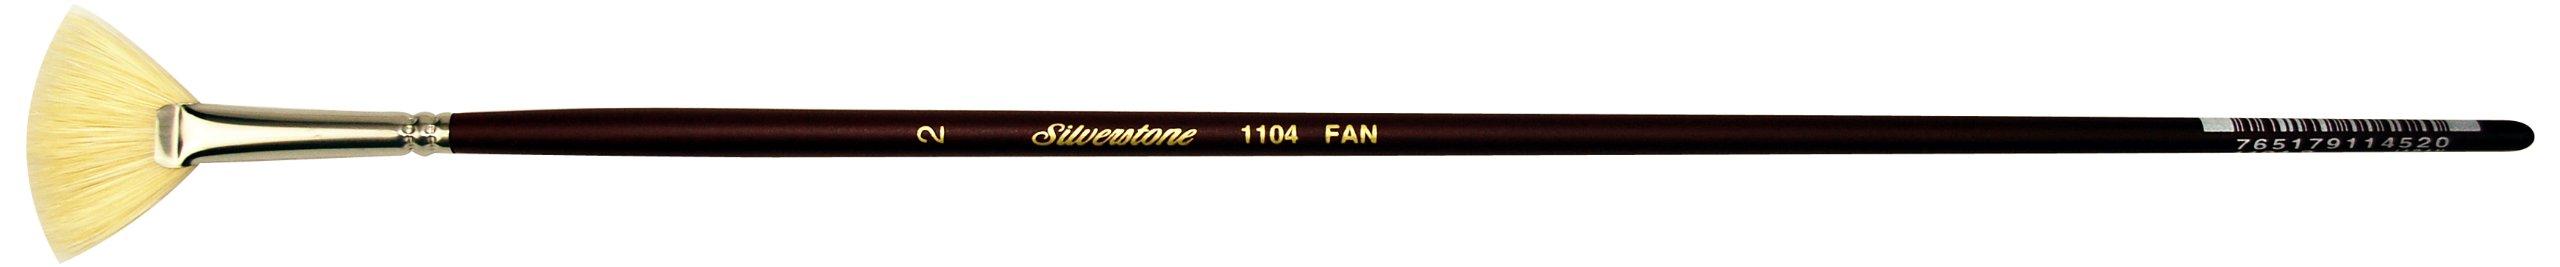 Silver Brush 1104-2 Silverstone Excellent Long Handle Hog Bristle Brush, Fan, Size 2